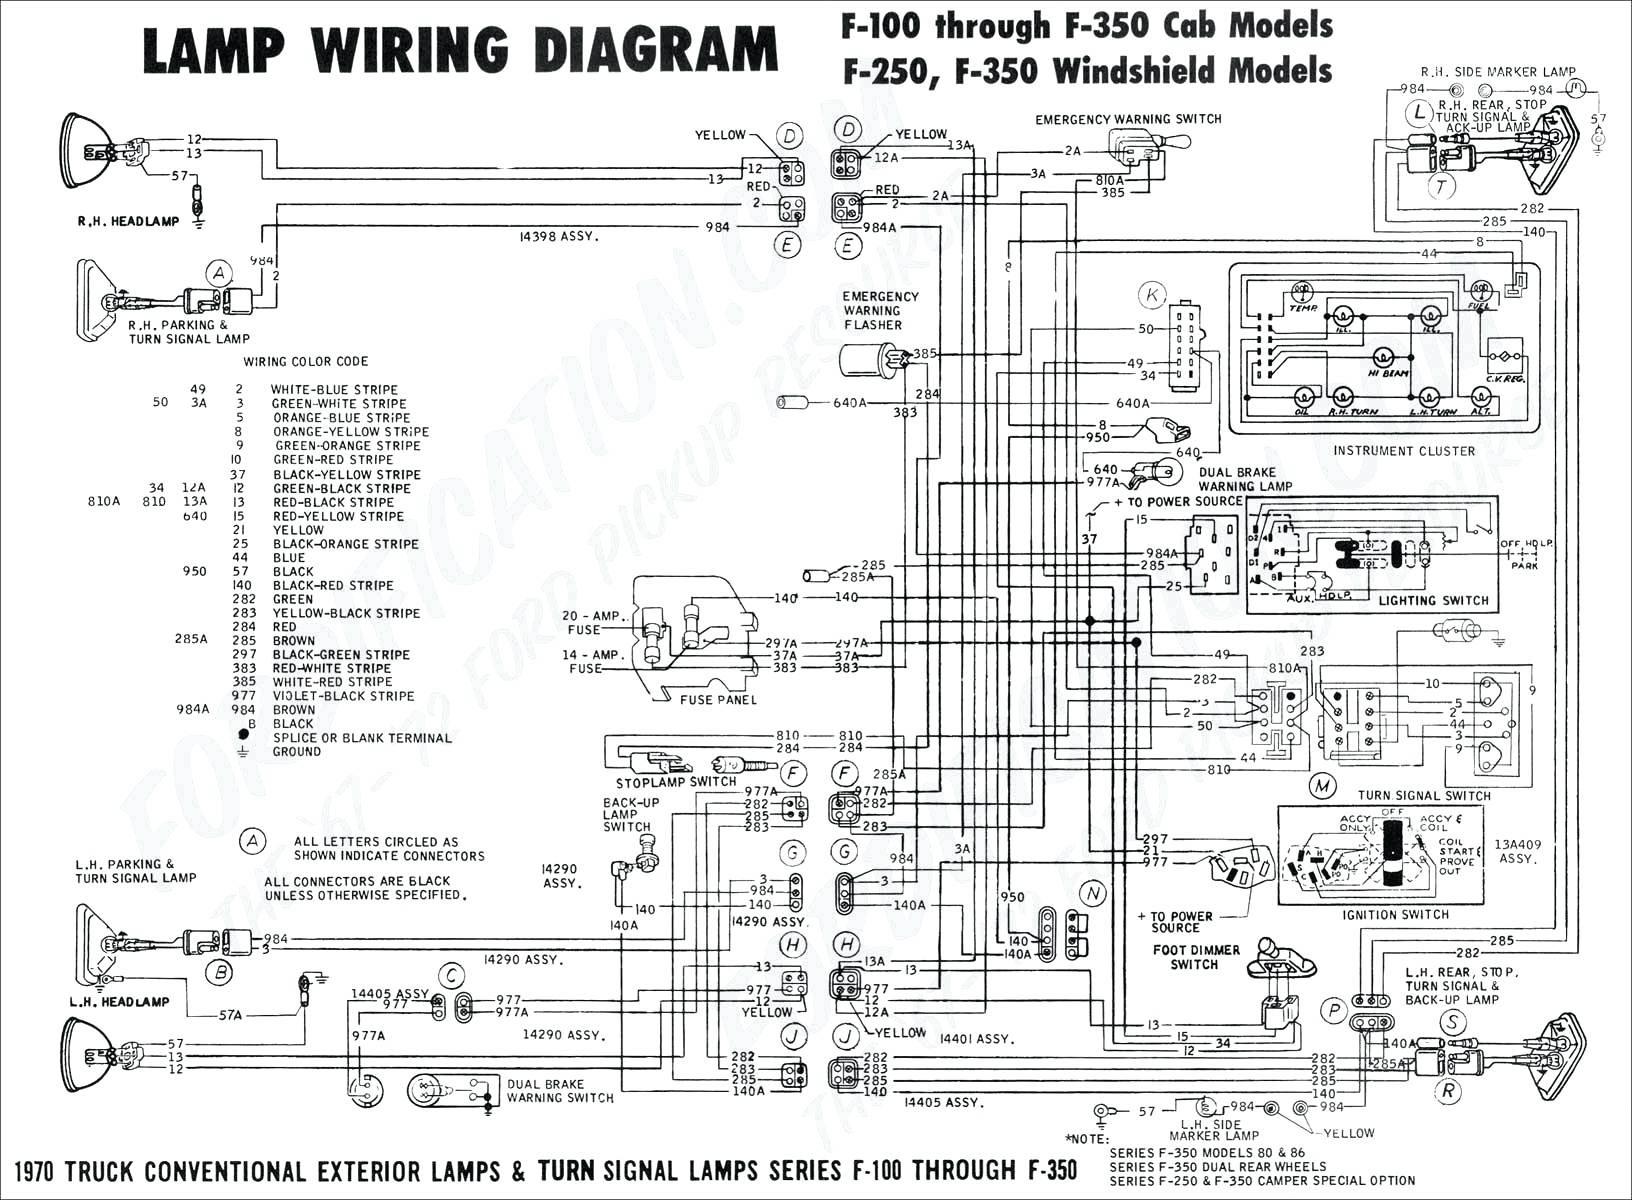 Tt 5221 Wiring Diagram Further Wiring Harness Diagram Pioneer Dxt Wiring Free Diagram